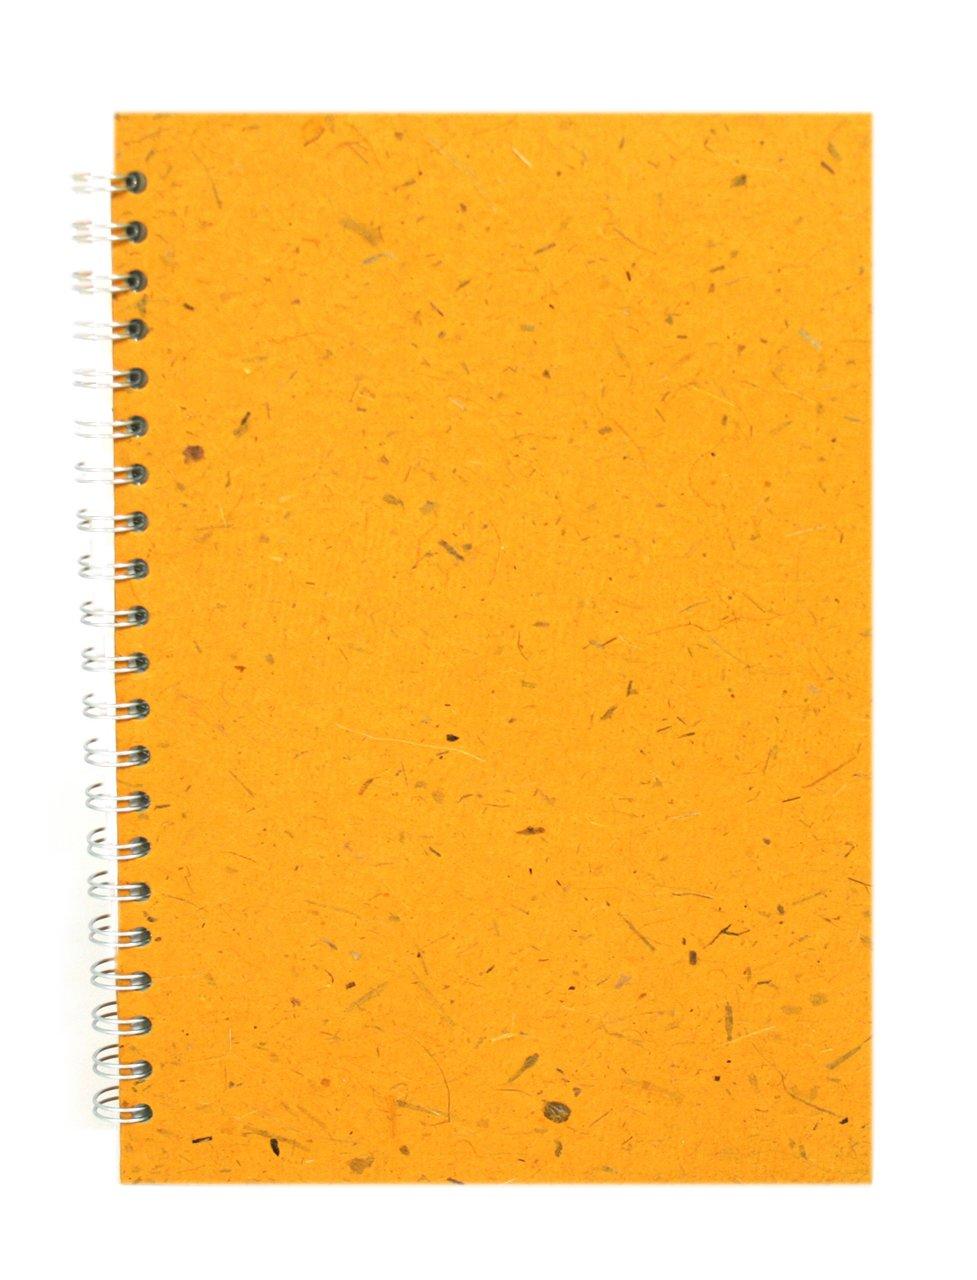 Pink Pig A4 Portrait Sketchbook White Cartridge paper 35 Leaves Blue 2 PACK